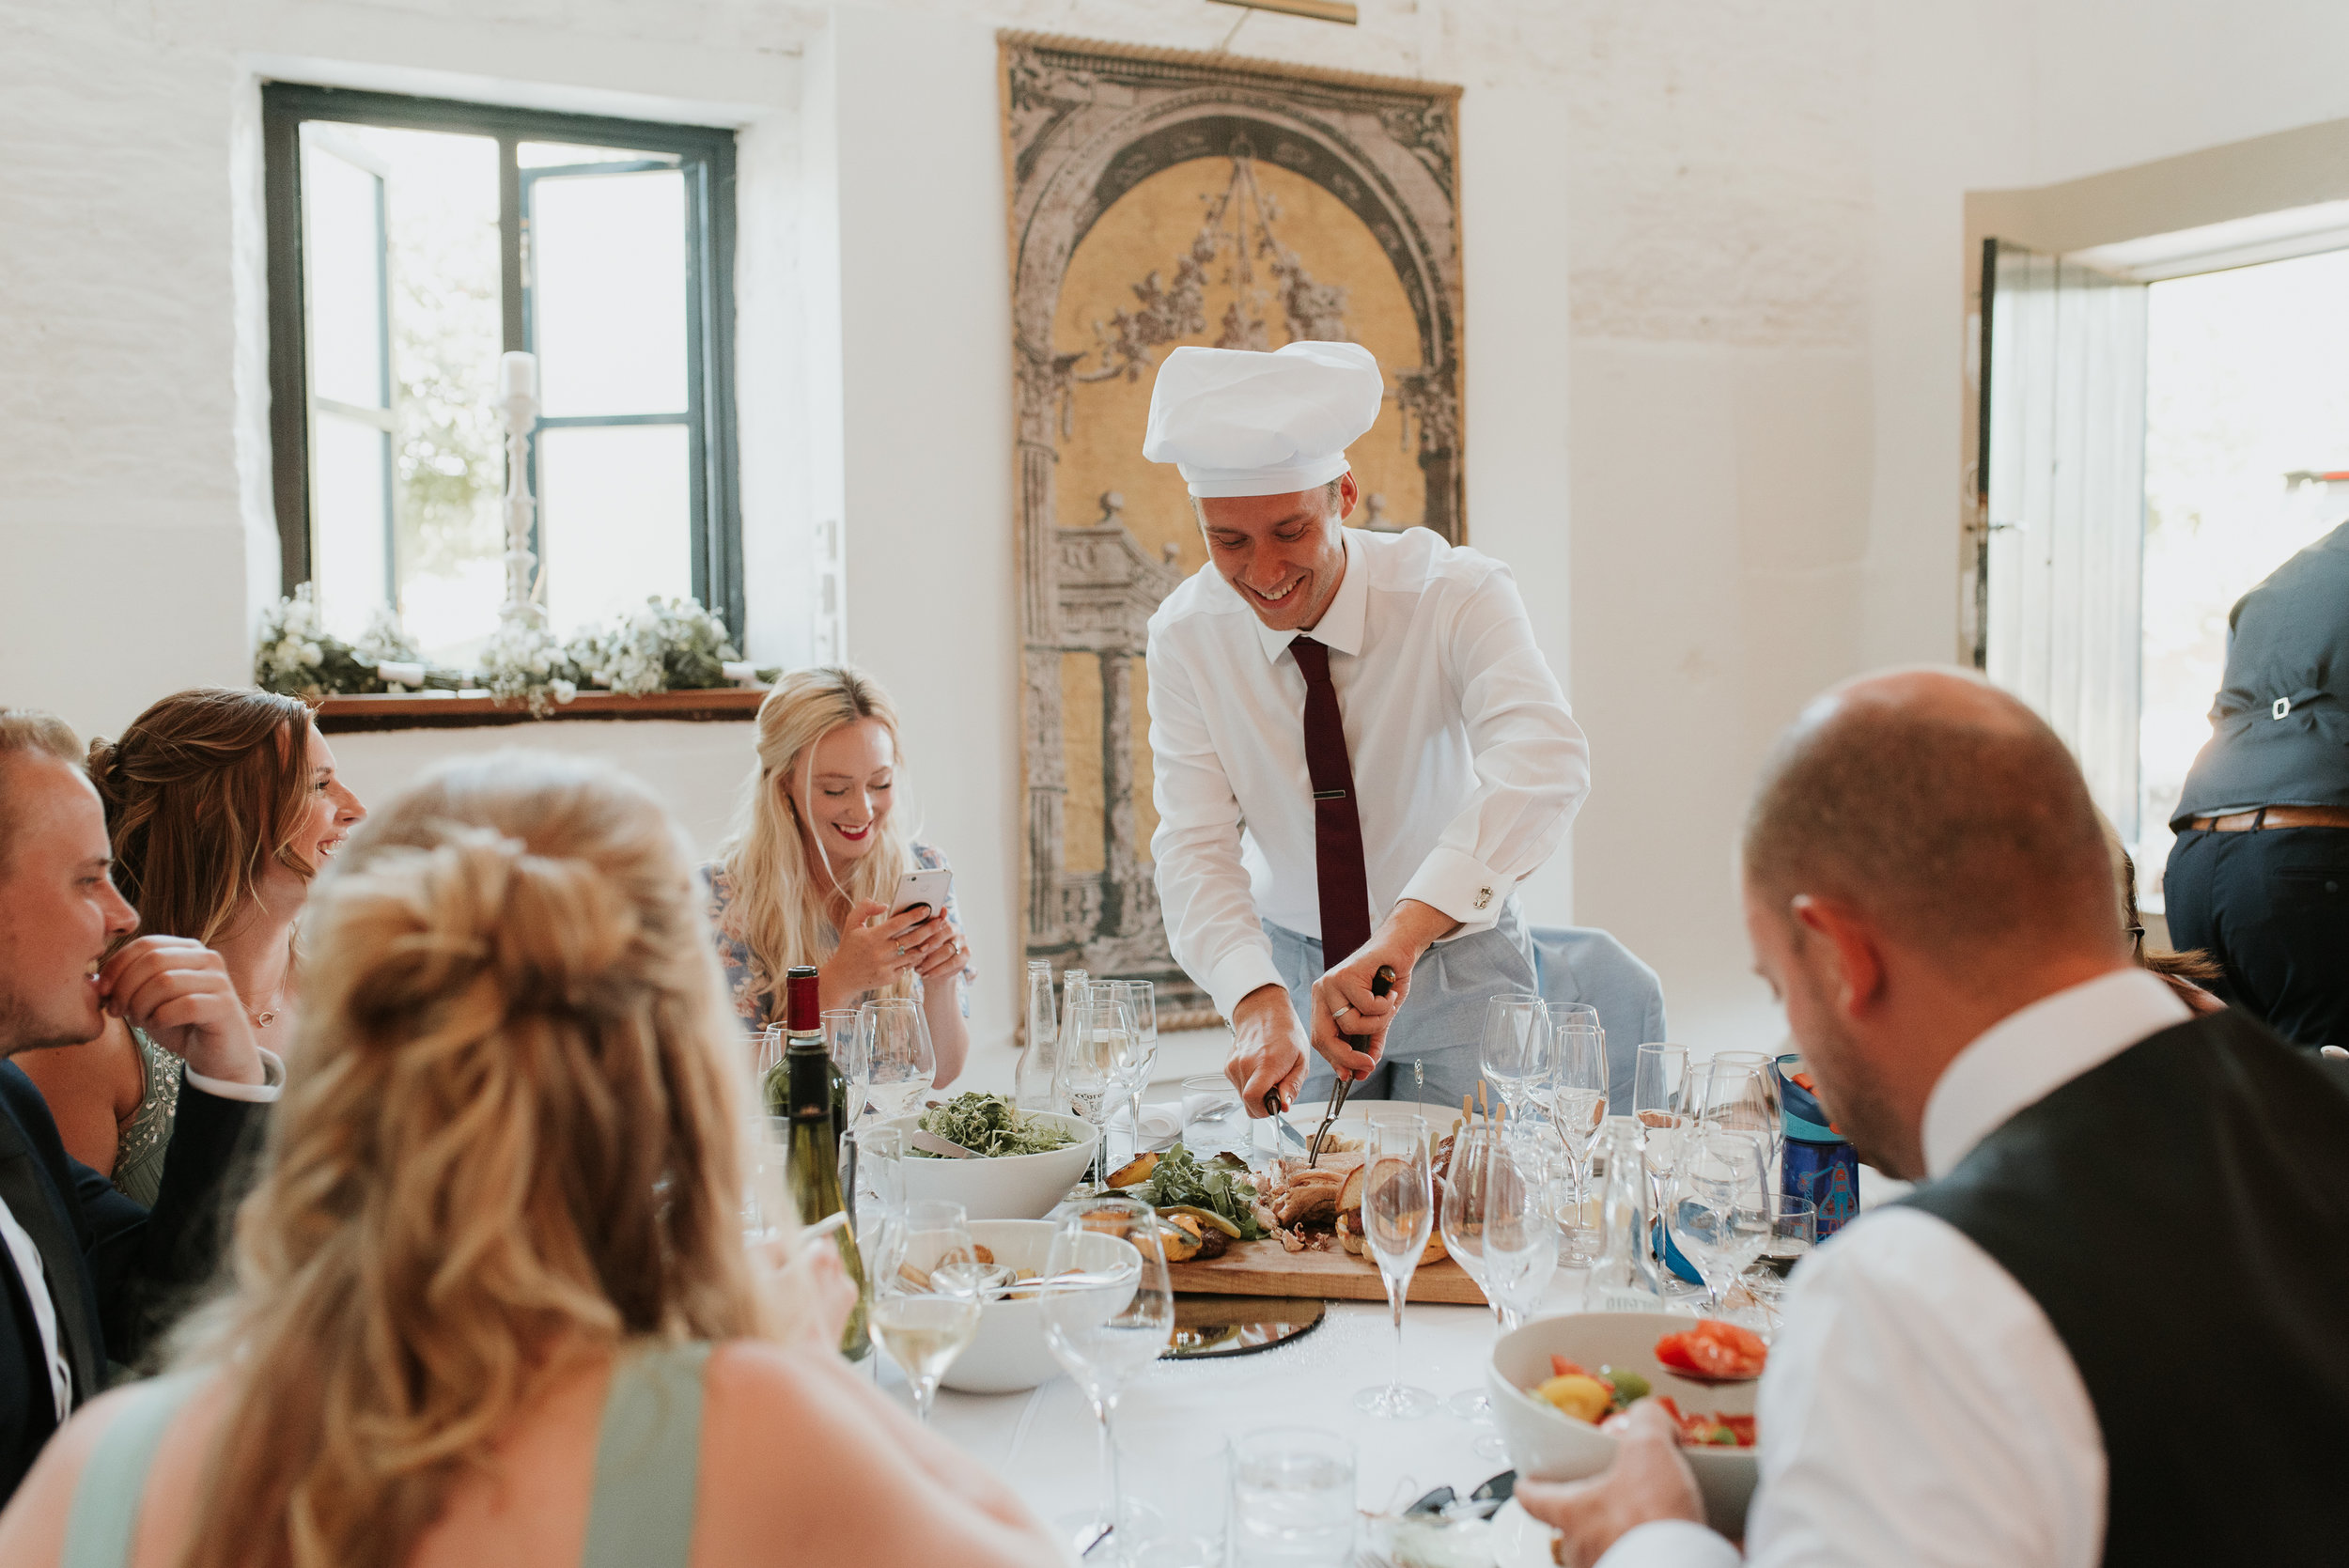 Oxfordshire-wedding-photographer-62.jpg